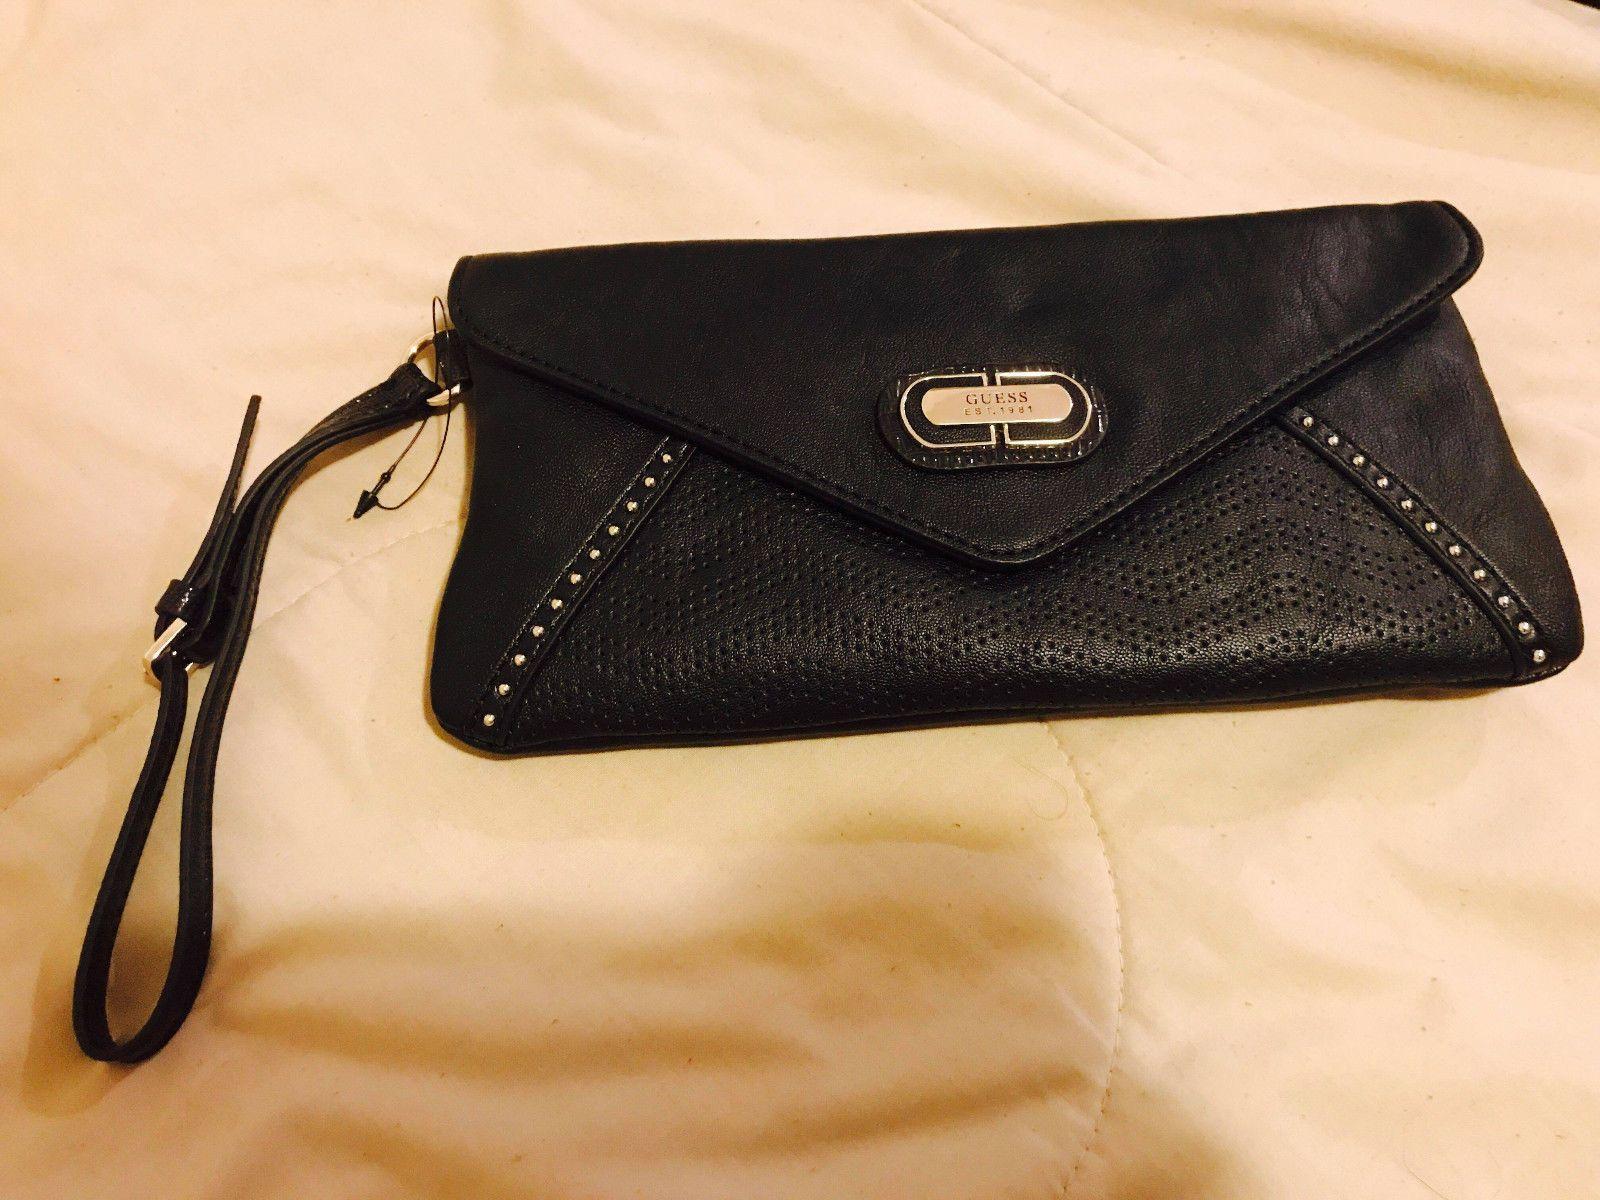 New Guess Black Wristlet Clutch Bag Handbag Plastic Tag Holder No Pap